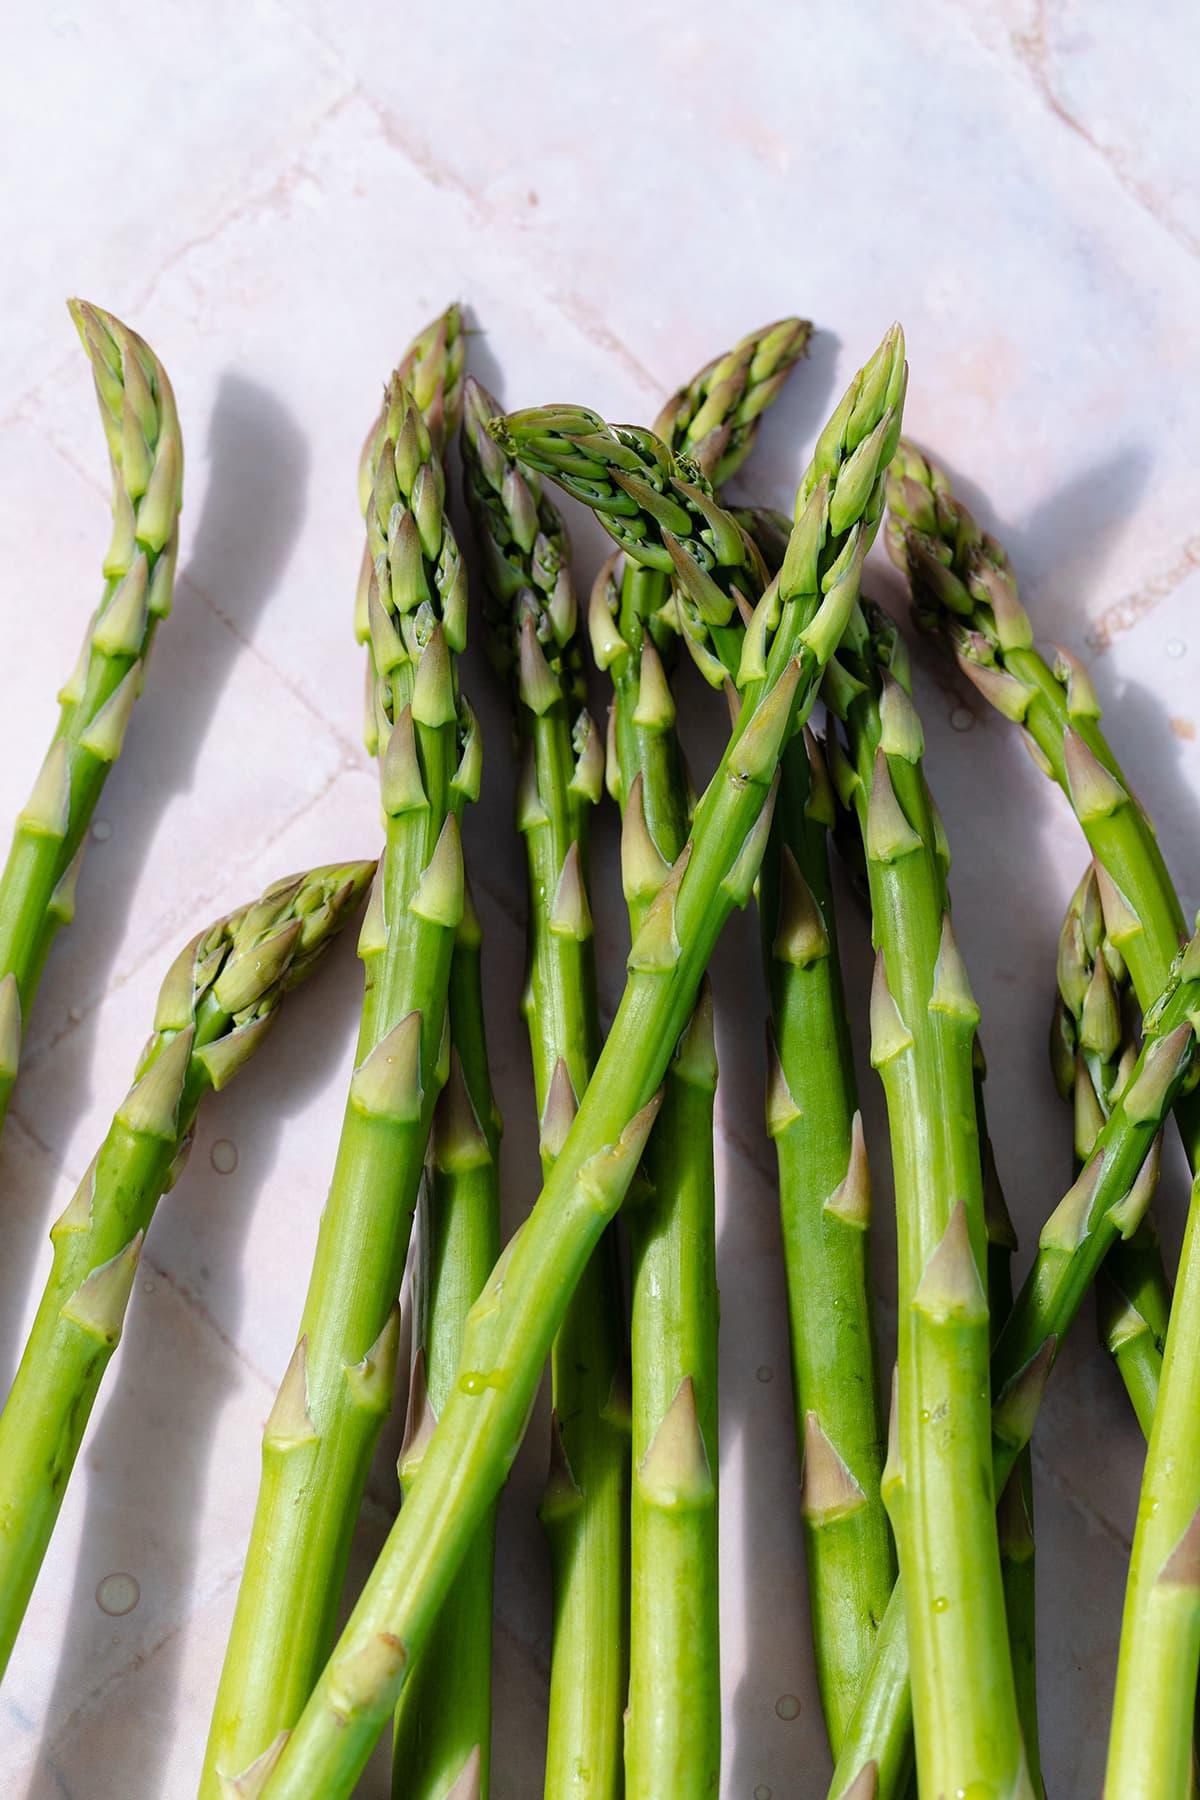 Fresh asparagus spears on pink tile background.